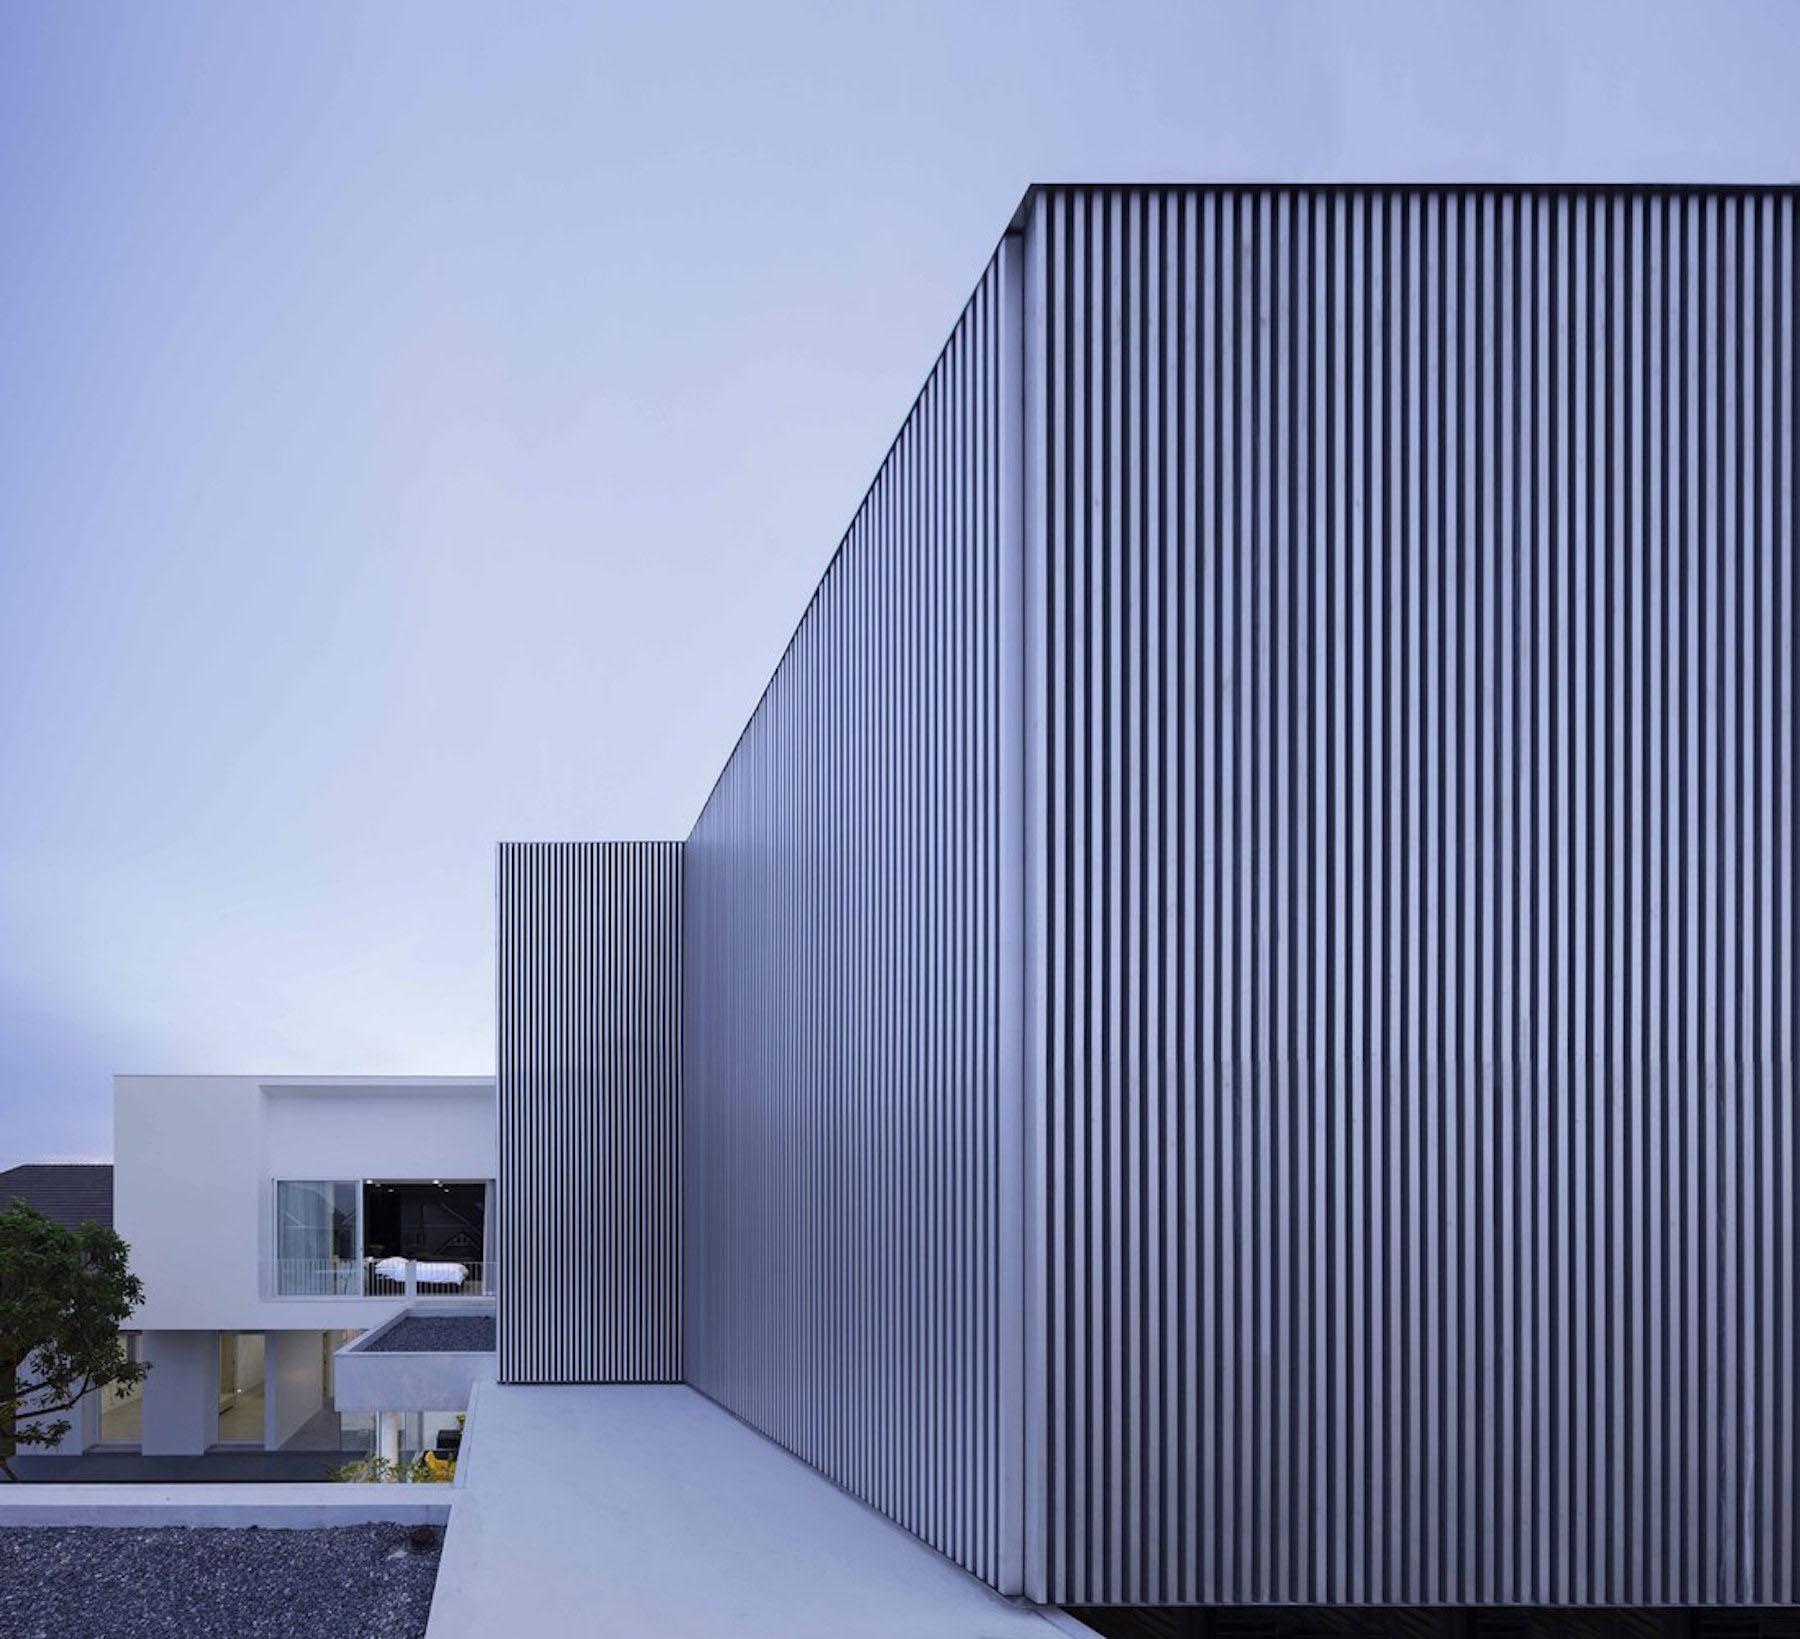 iGNANT-Architecture-Ayutt-And-Associates-Design-White-Box-House-05